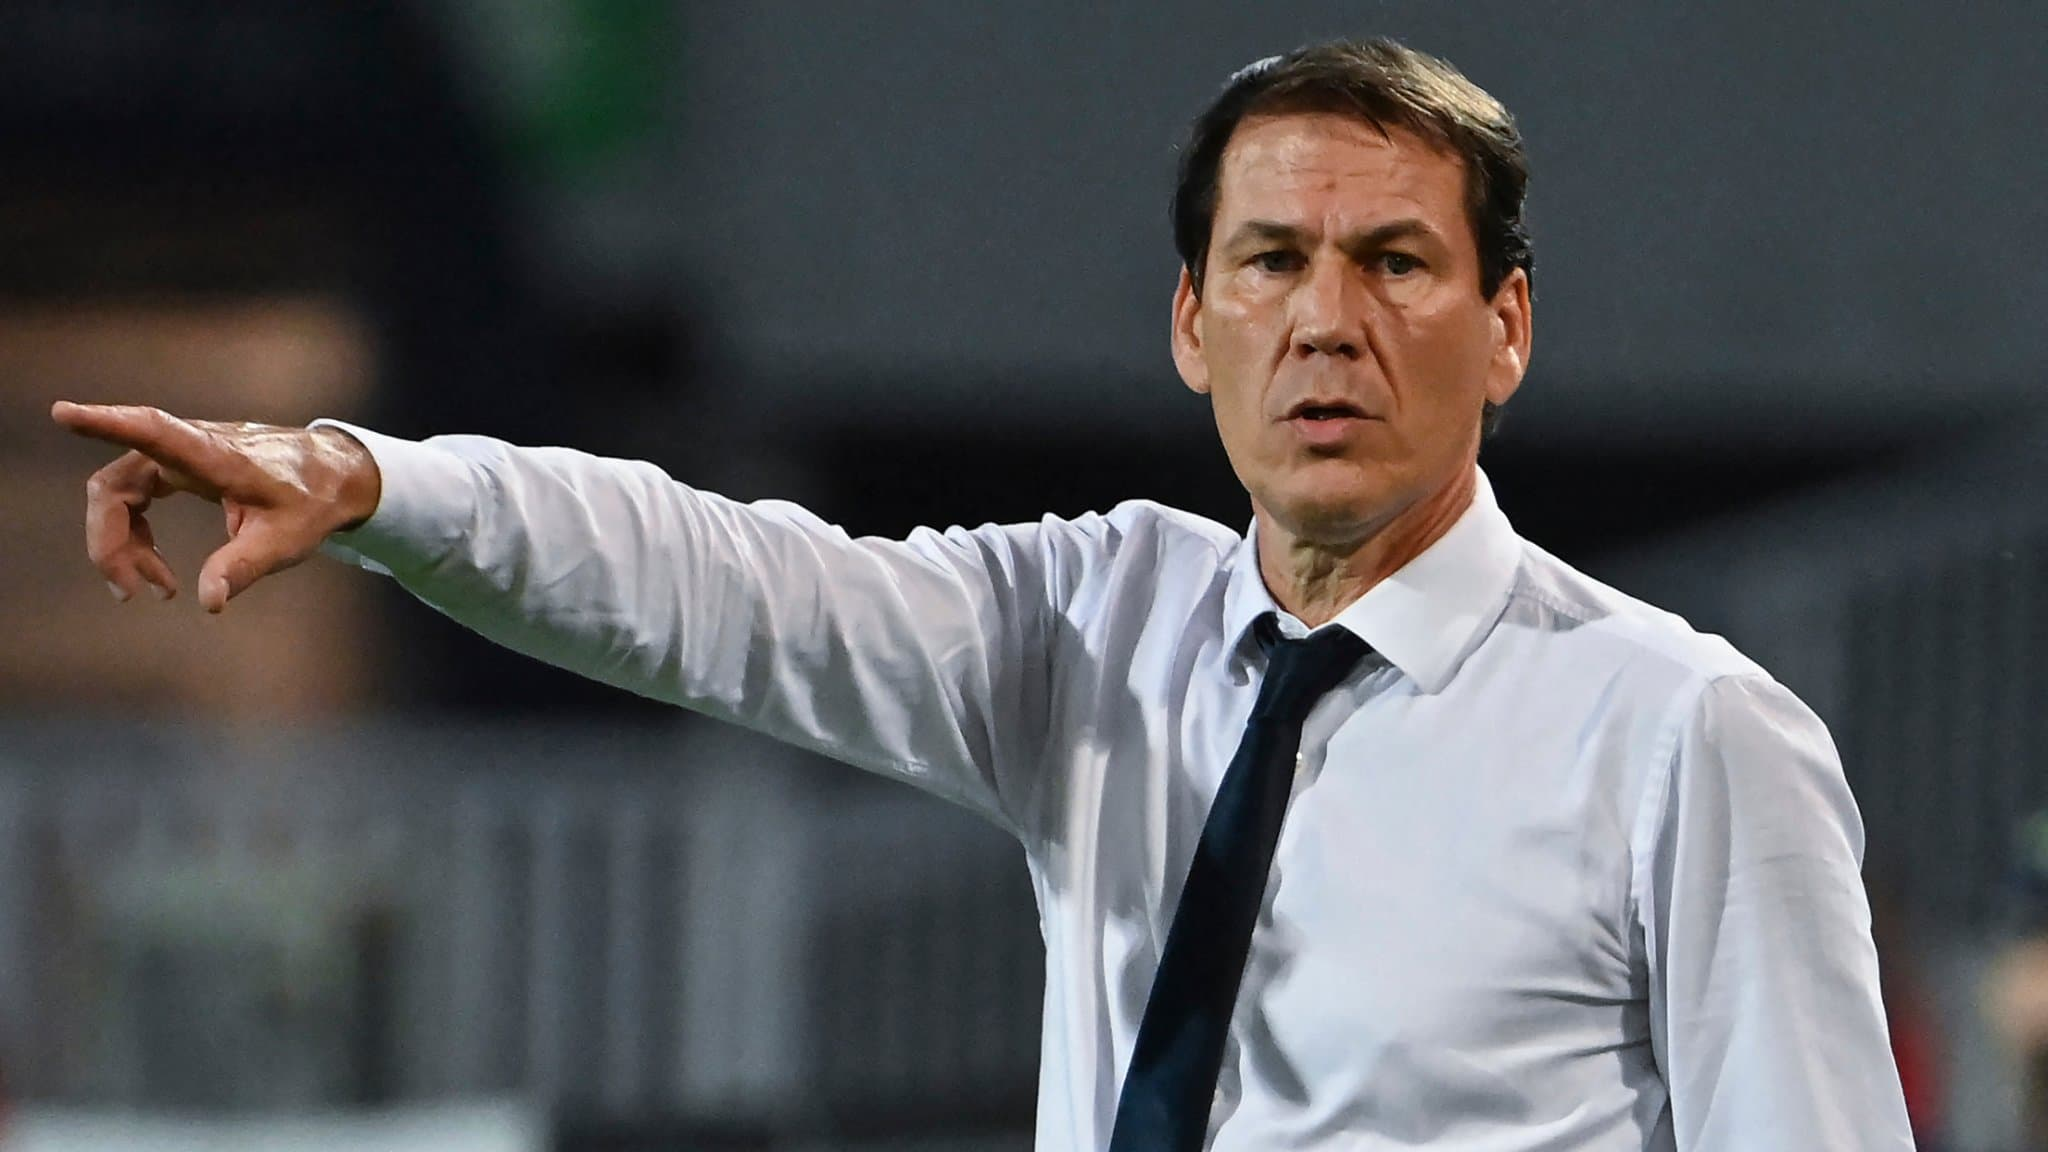 Mercato: Garcia veut rebondir dans un grand club européen, après l'OL